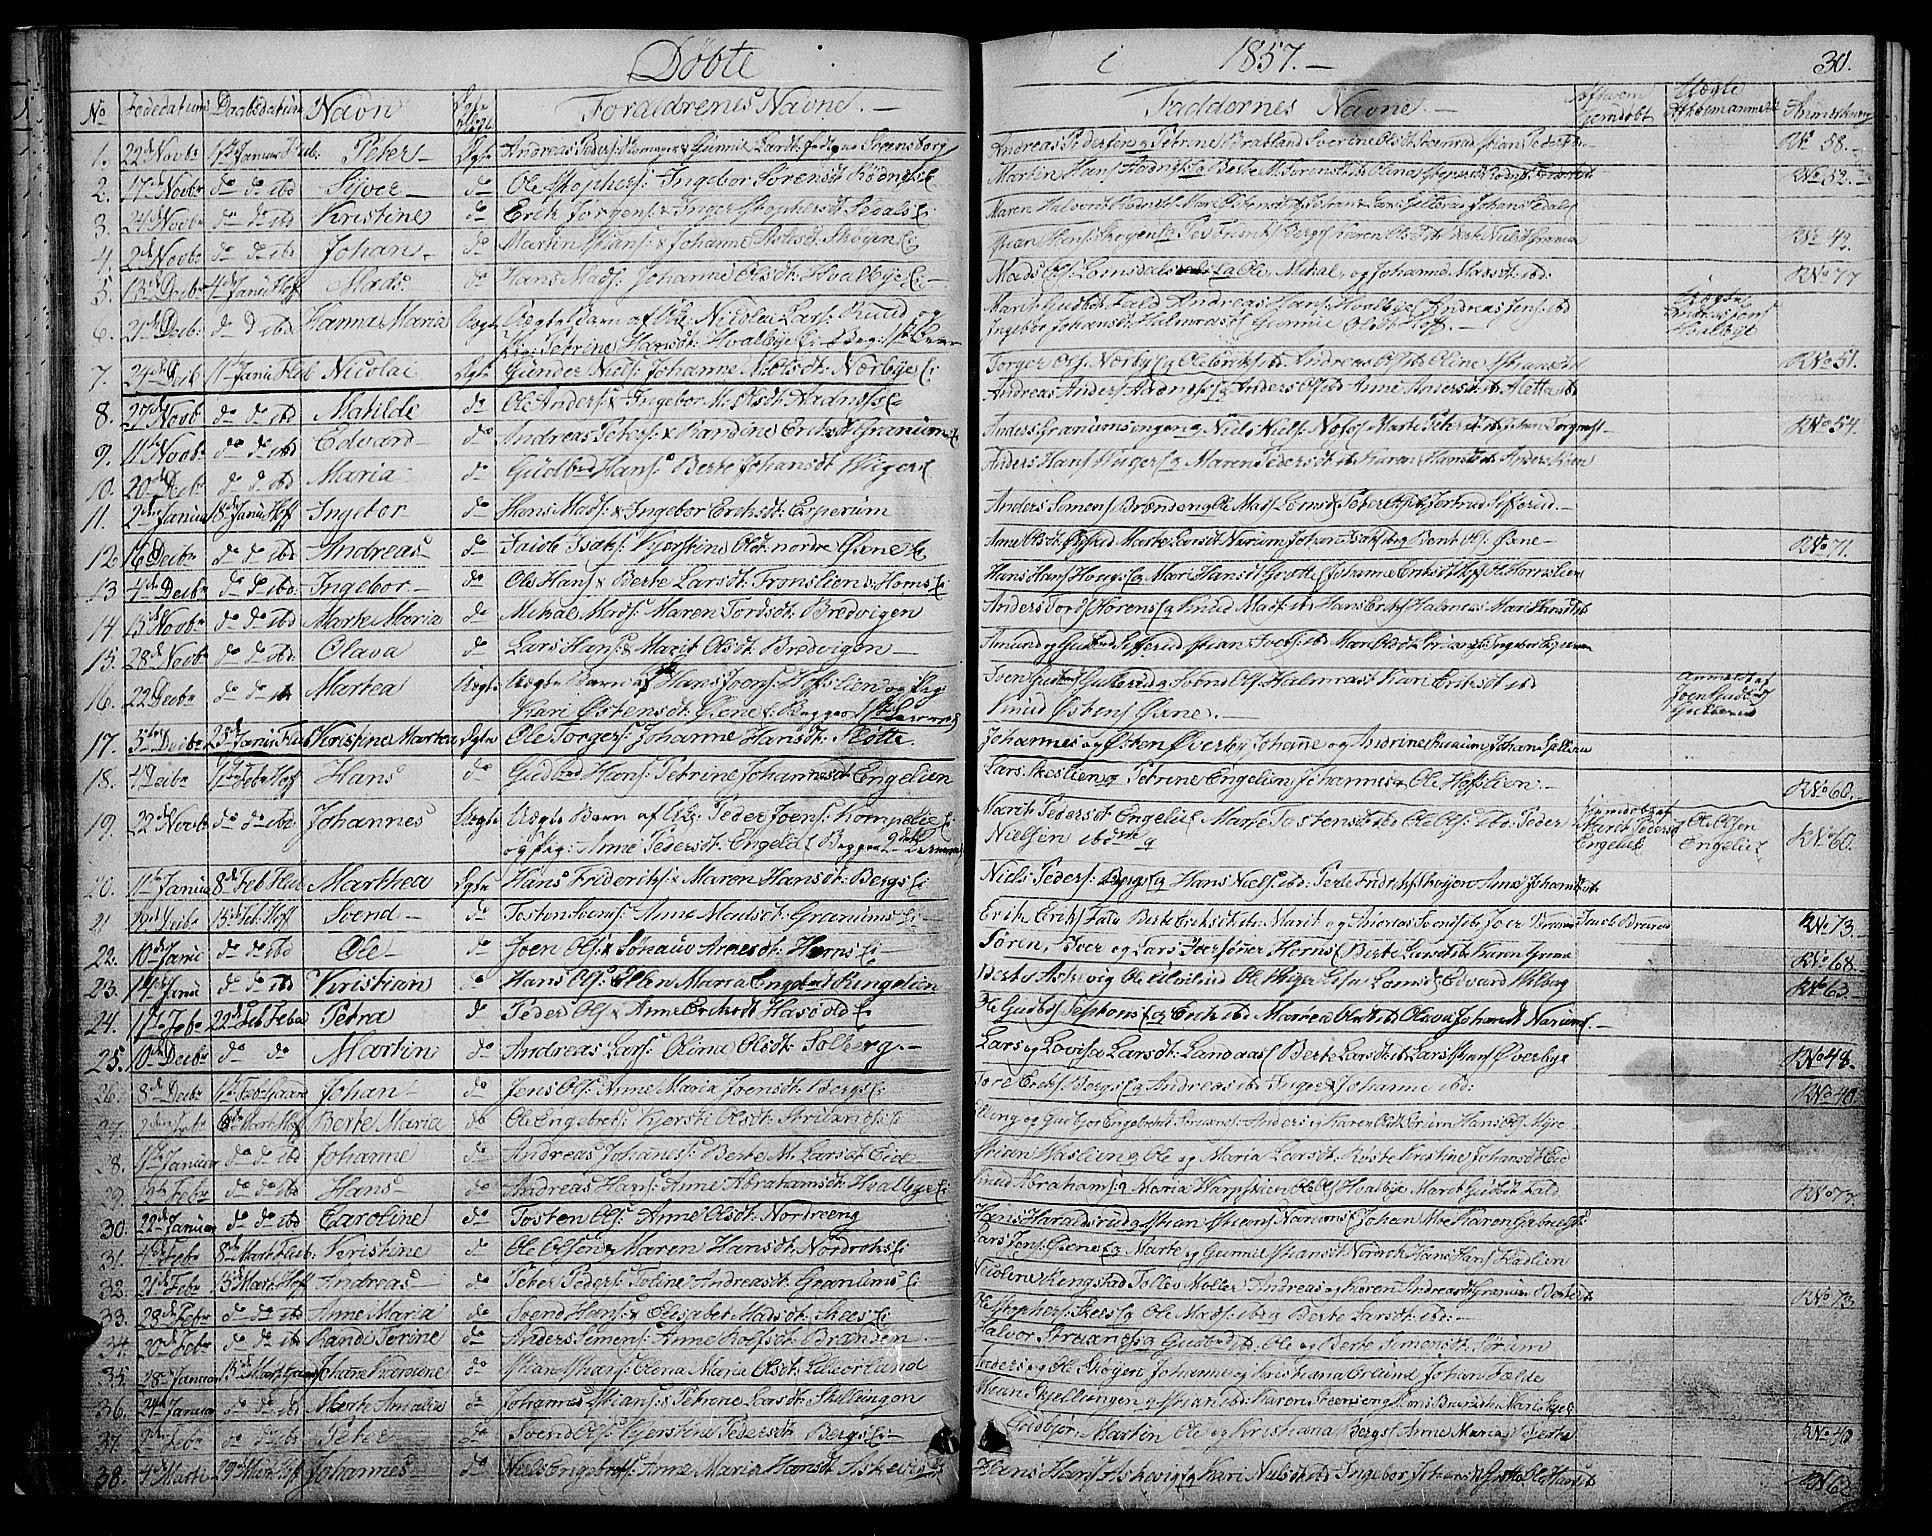 SAH, Søndre Land prestekontor, L/L0001: Klokkerbok nr. 1, 1849-1883, s. 30